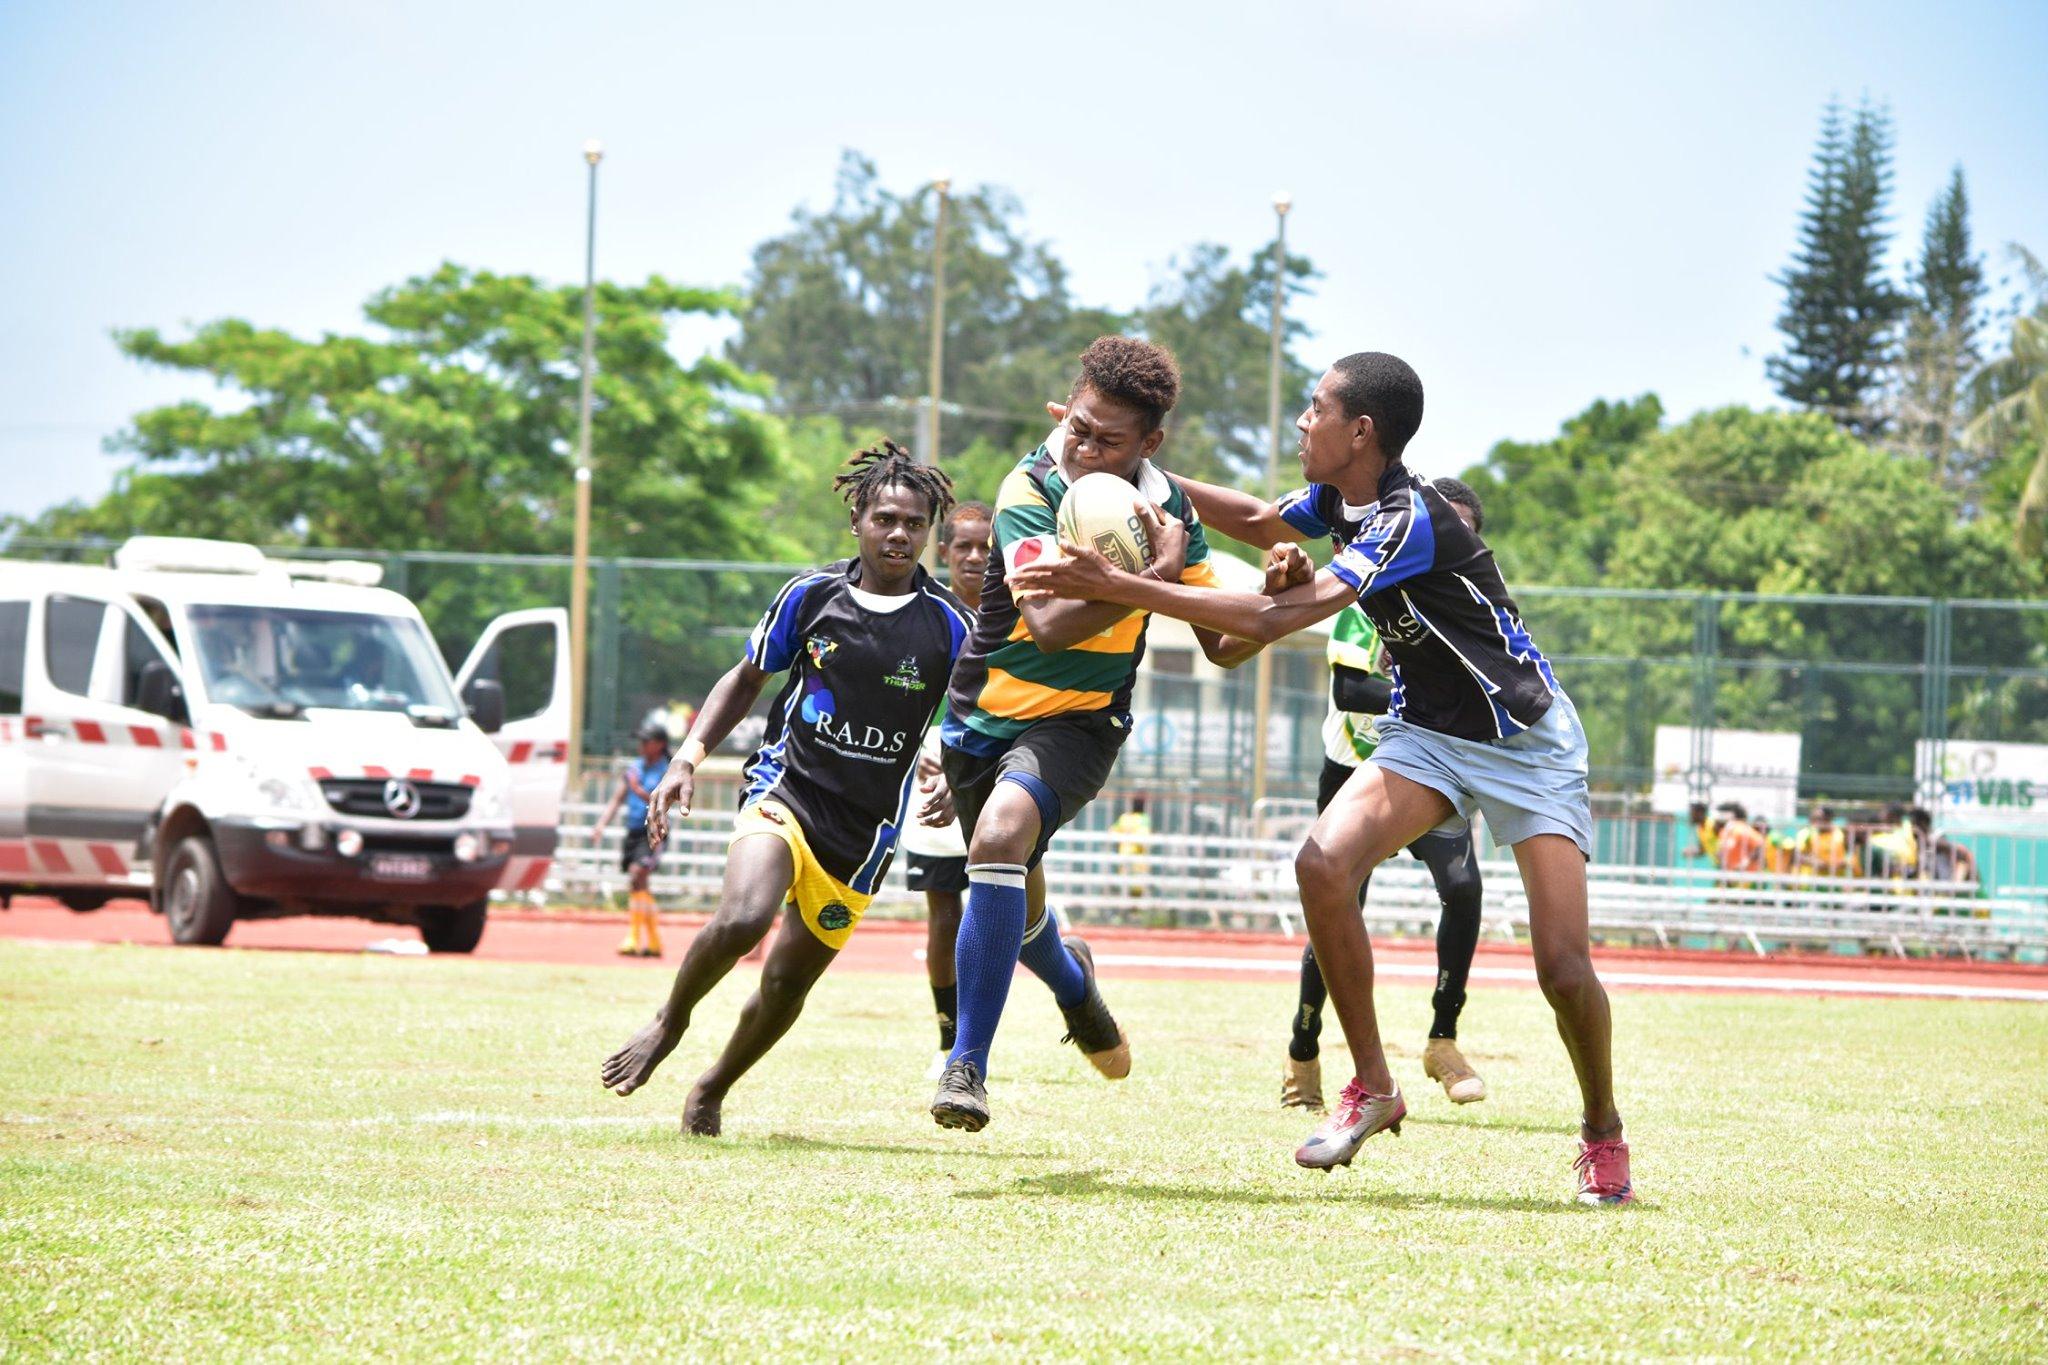 Vanuatu and Pacifique Treize to host Testing Day in Port Vila